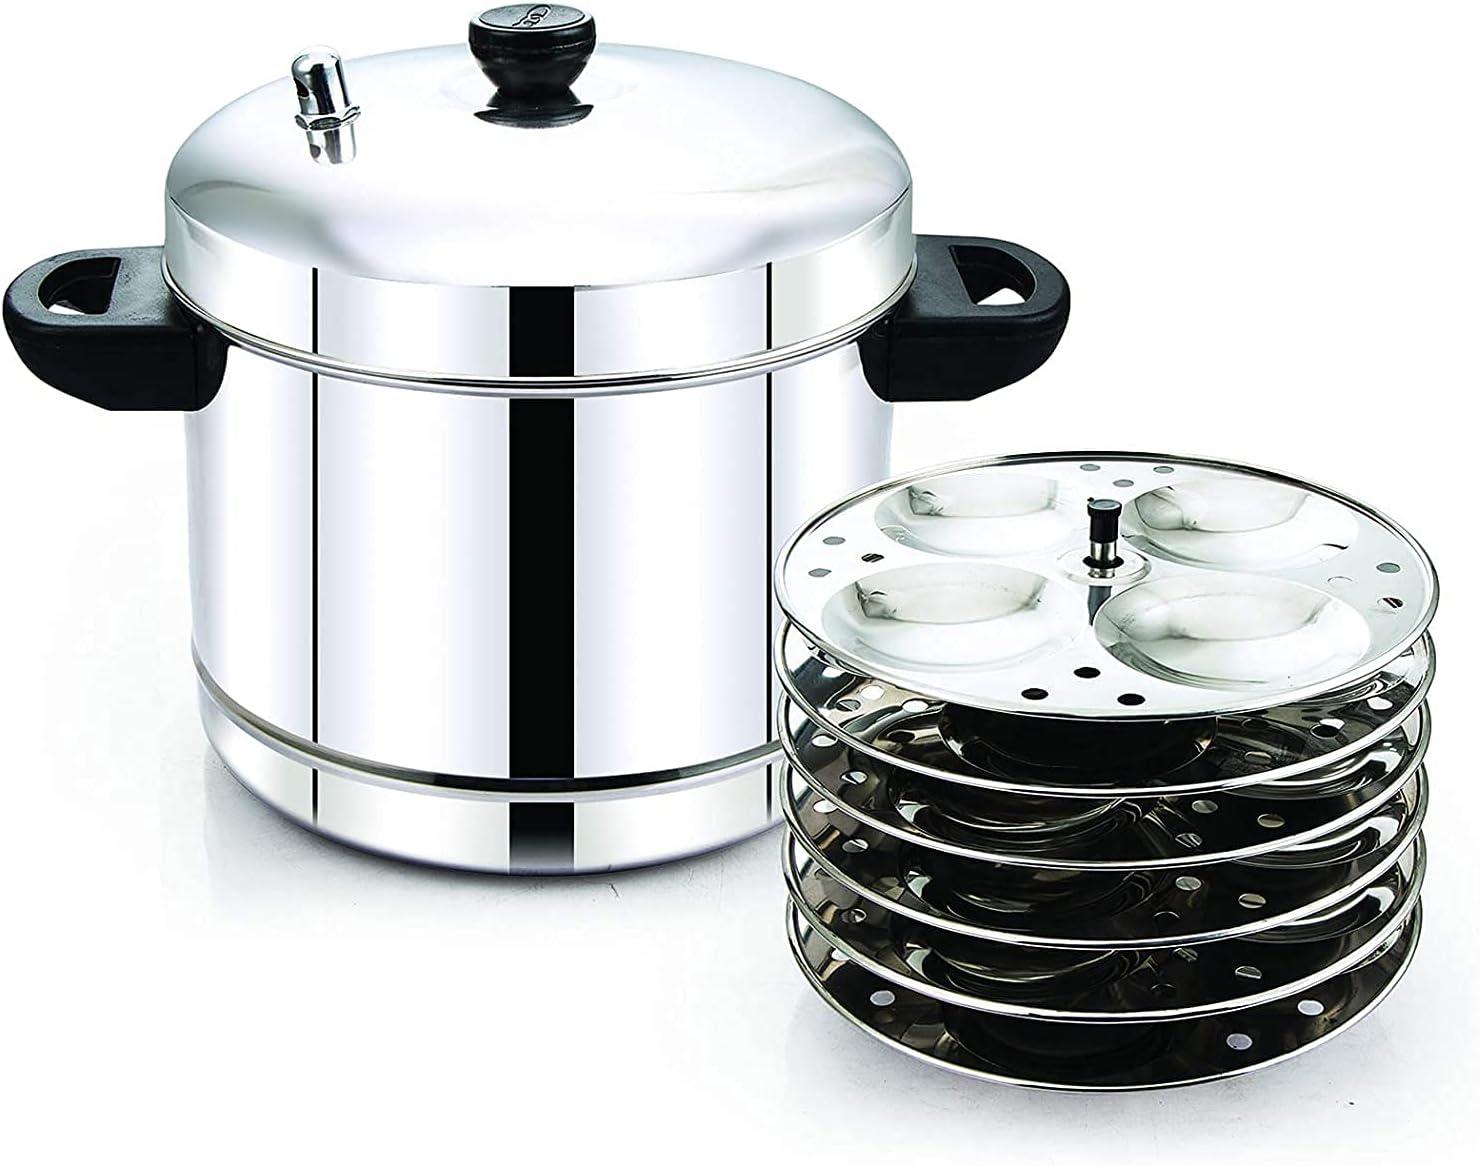 Idli Cooker idli Steamer idli Maker idli Pot with Free Wooden Set of 5 Pieces spatulas Export Quality Stainless Steel 6 Plates (24 idlis)